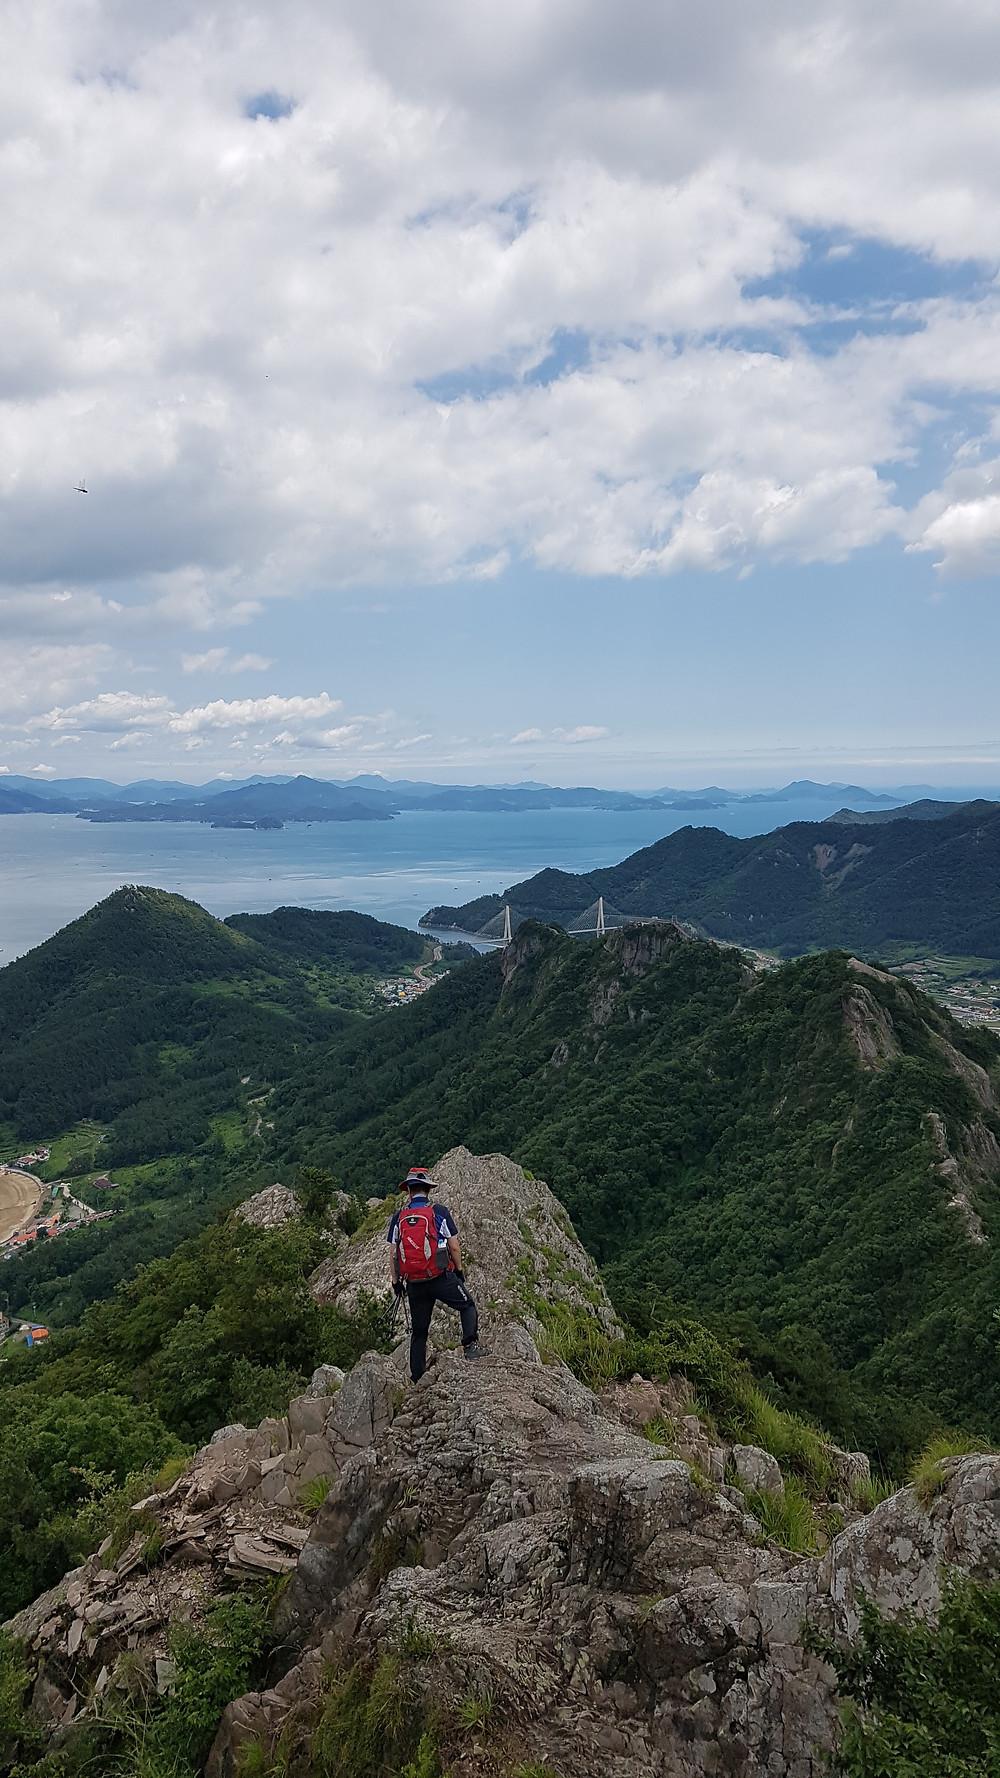 Man hiking on a rocky ridge